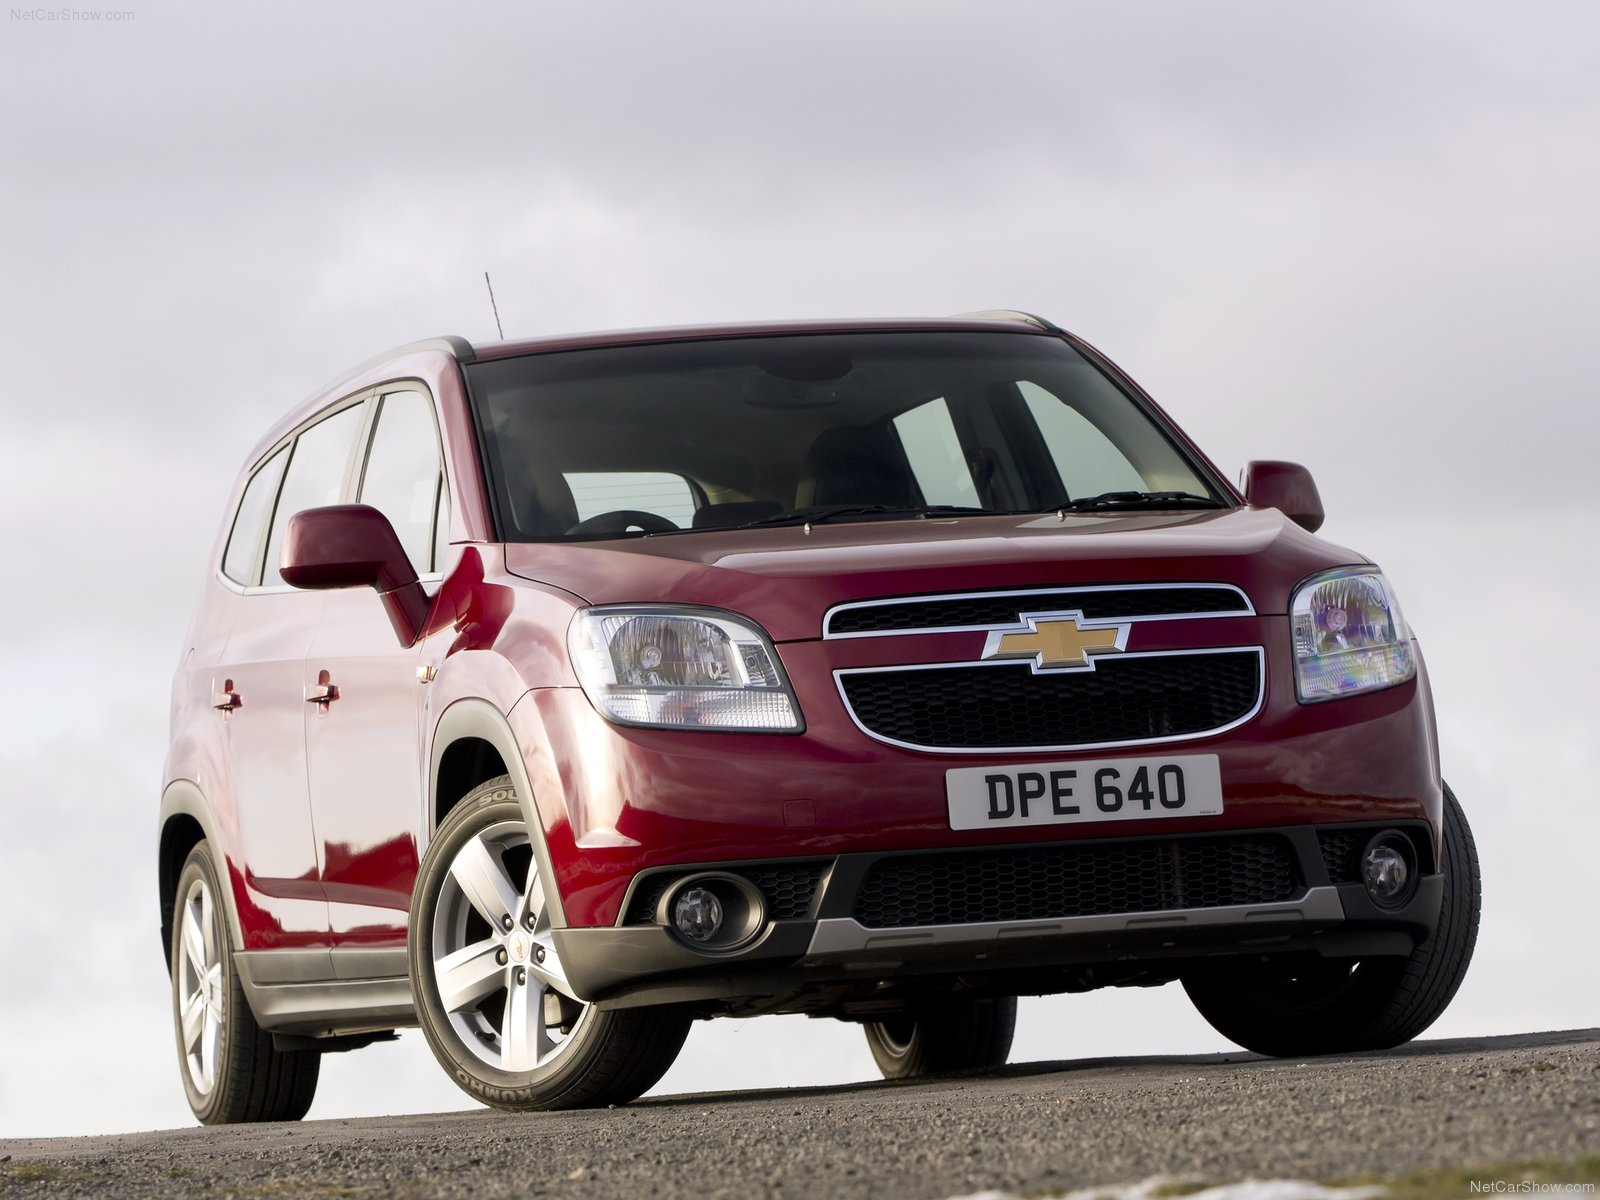 co ltz trim manual orlando for transmission used uk motors chevrolet cars sale